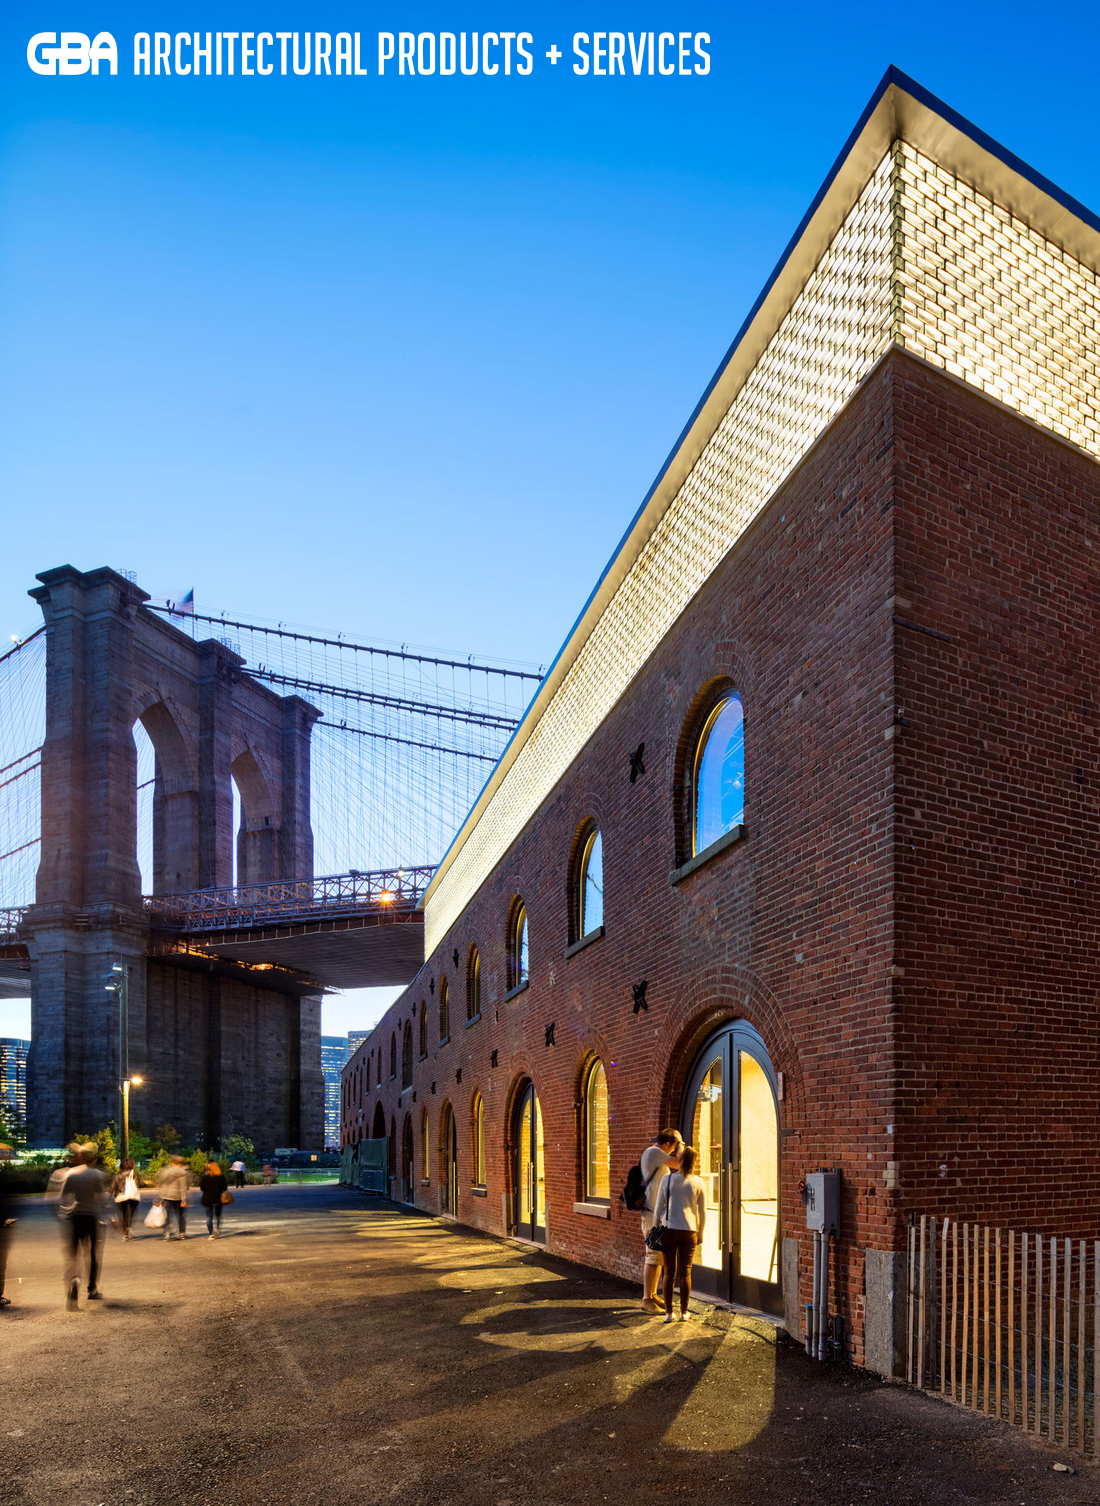 St. Anns Warehouse (2)